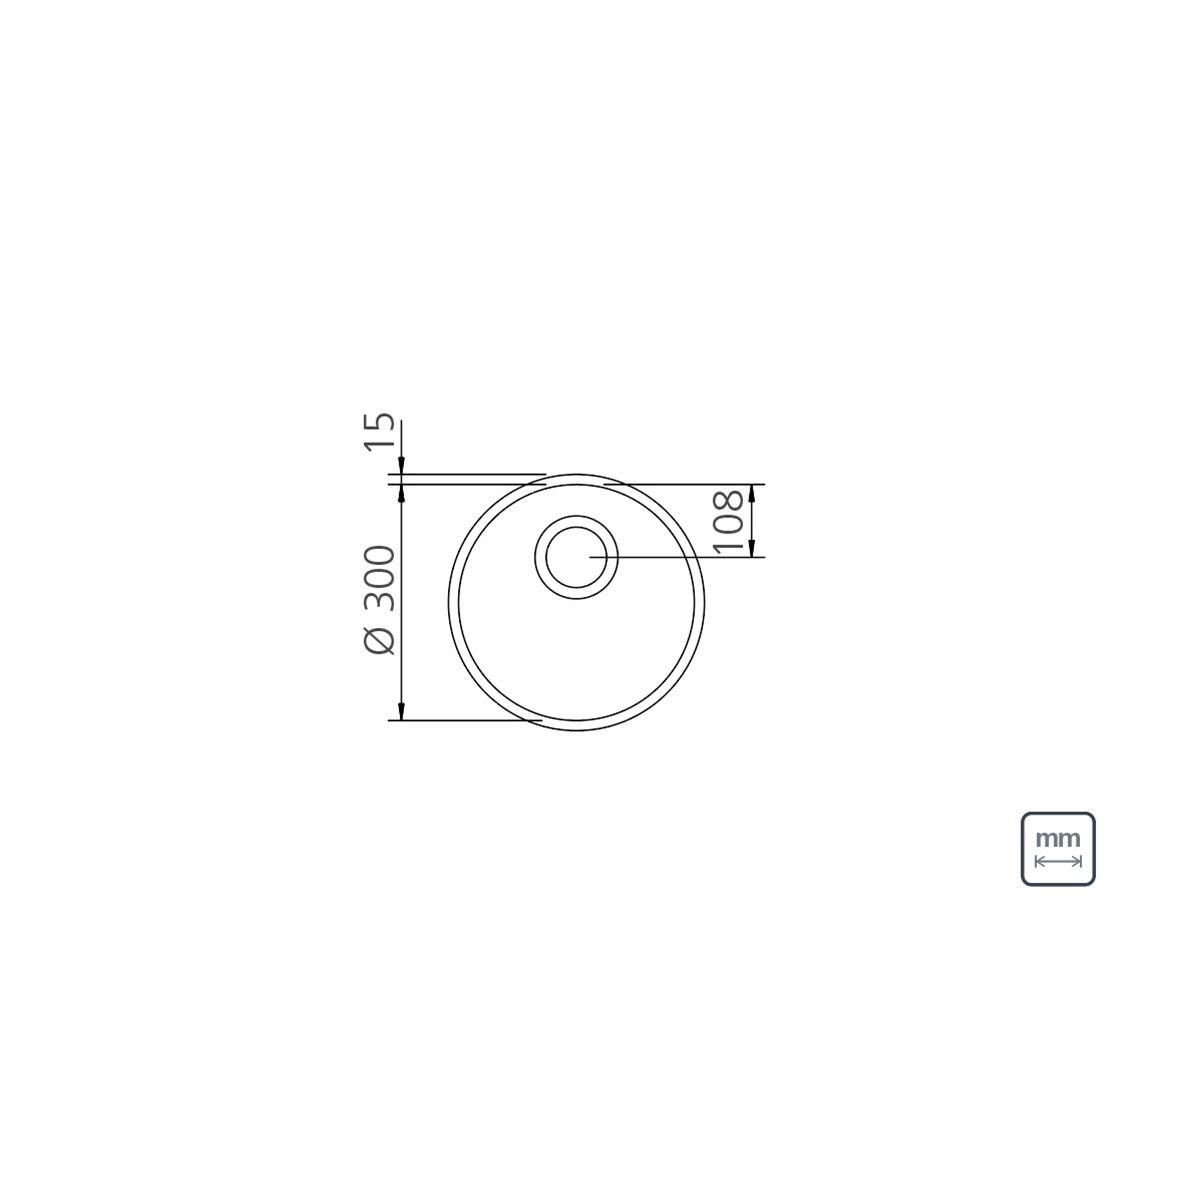 Cuba Inox Redonda de 30cm Tramontina Prime  - DOTEC SHOP